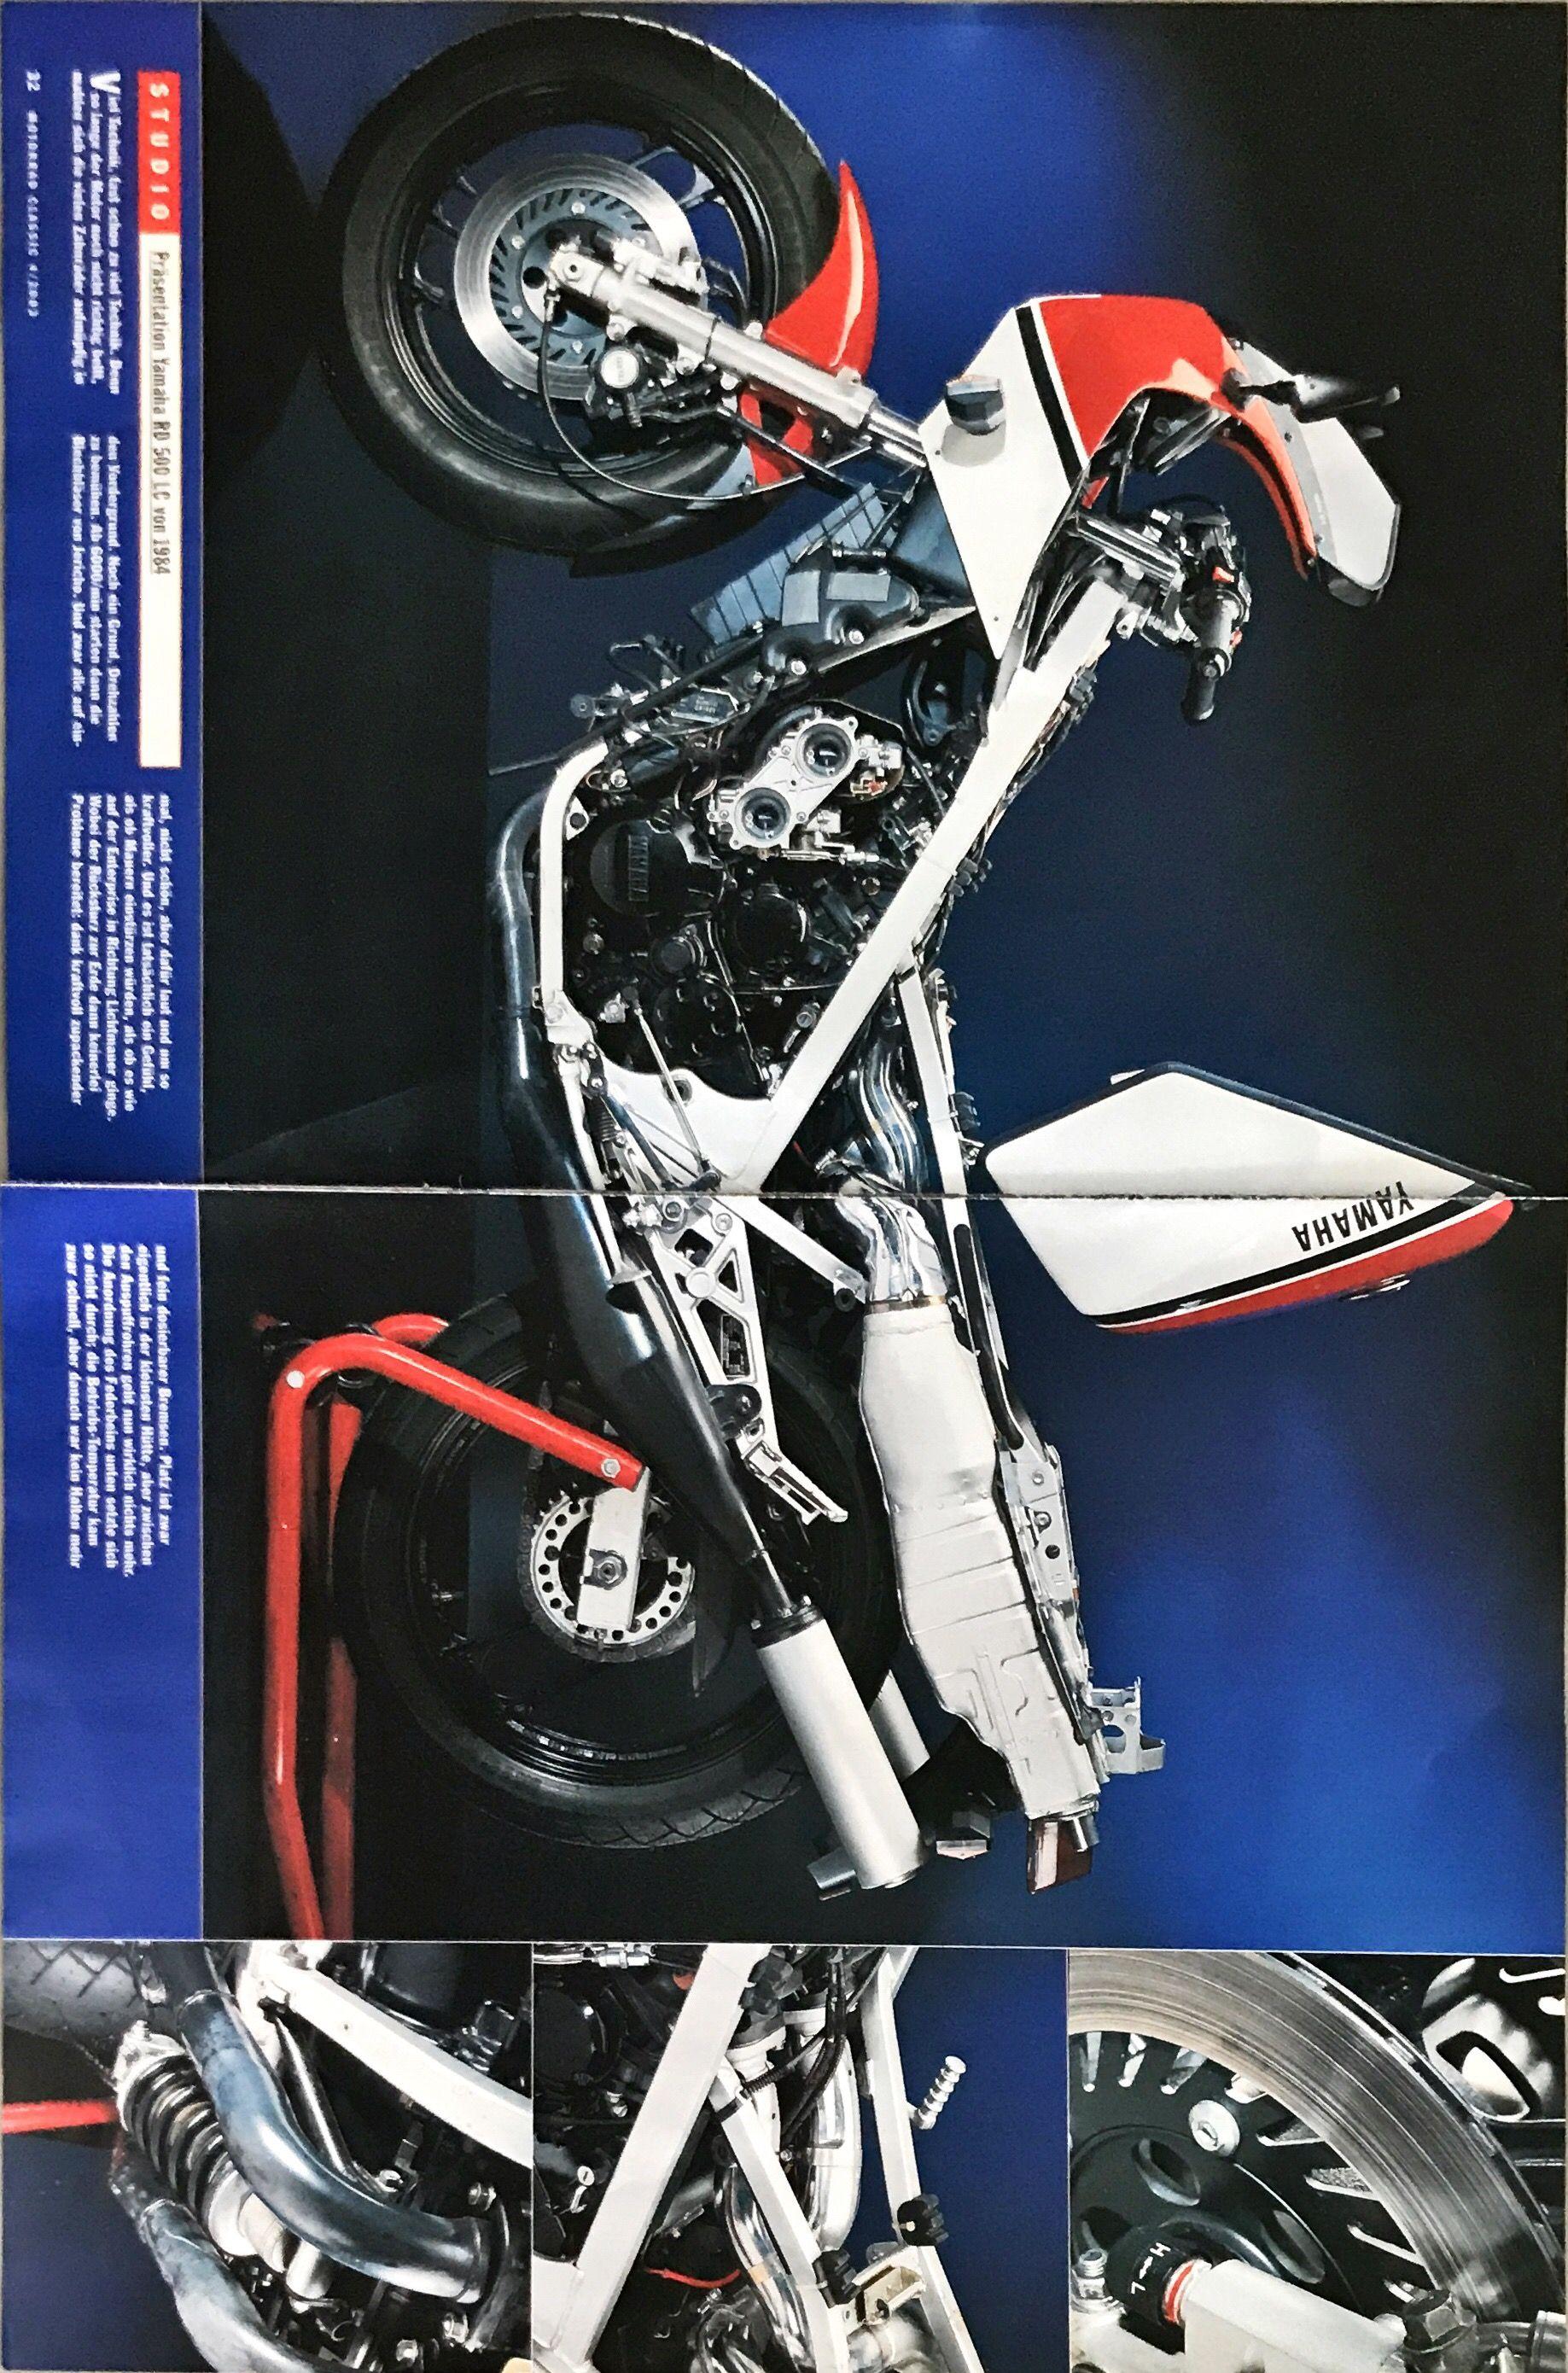 Moto Bike Old Bikes Sportbikes Yamaha Carotorcycles Motorbikes